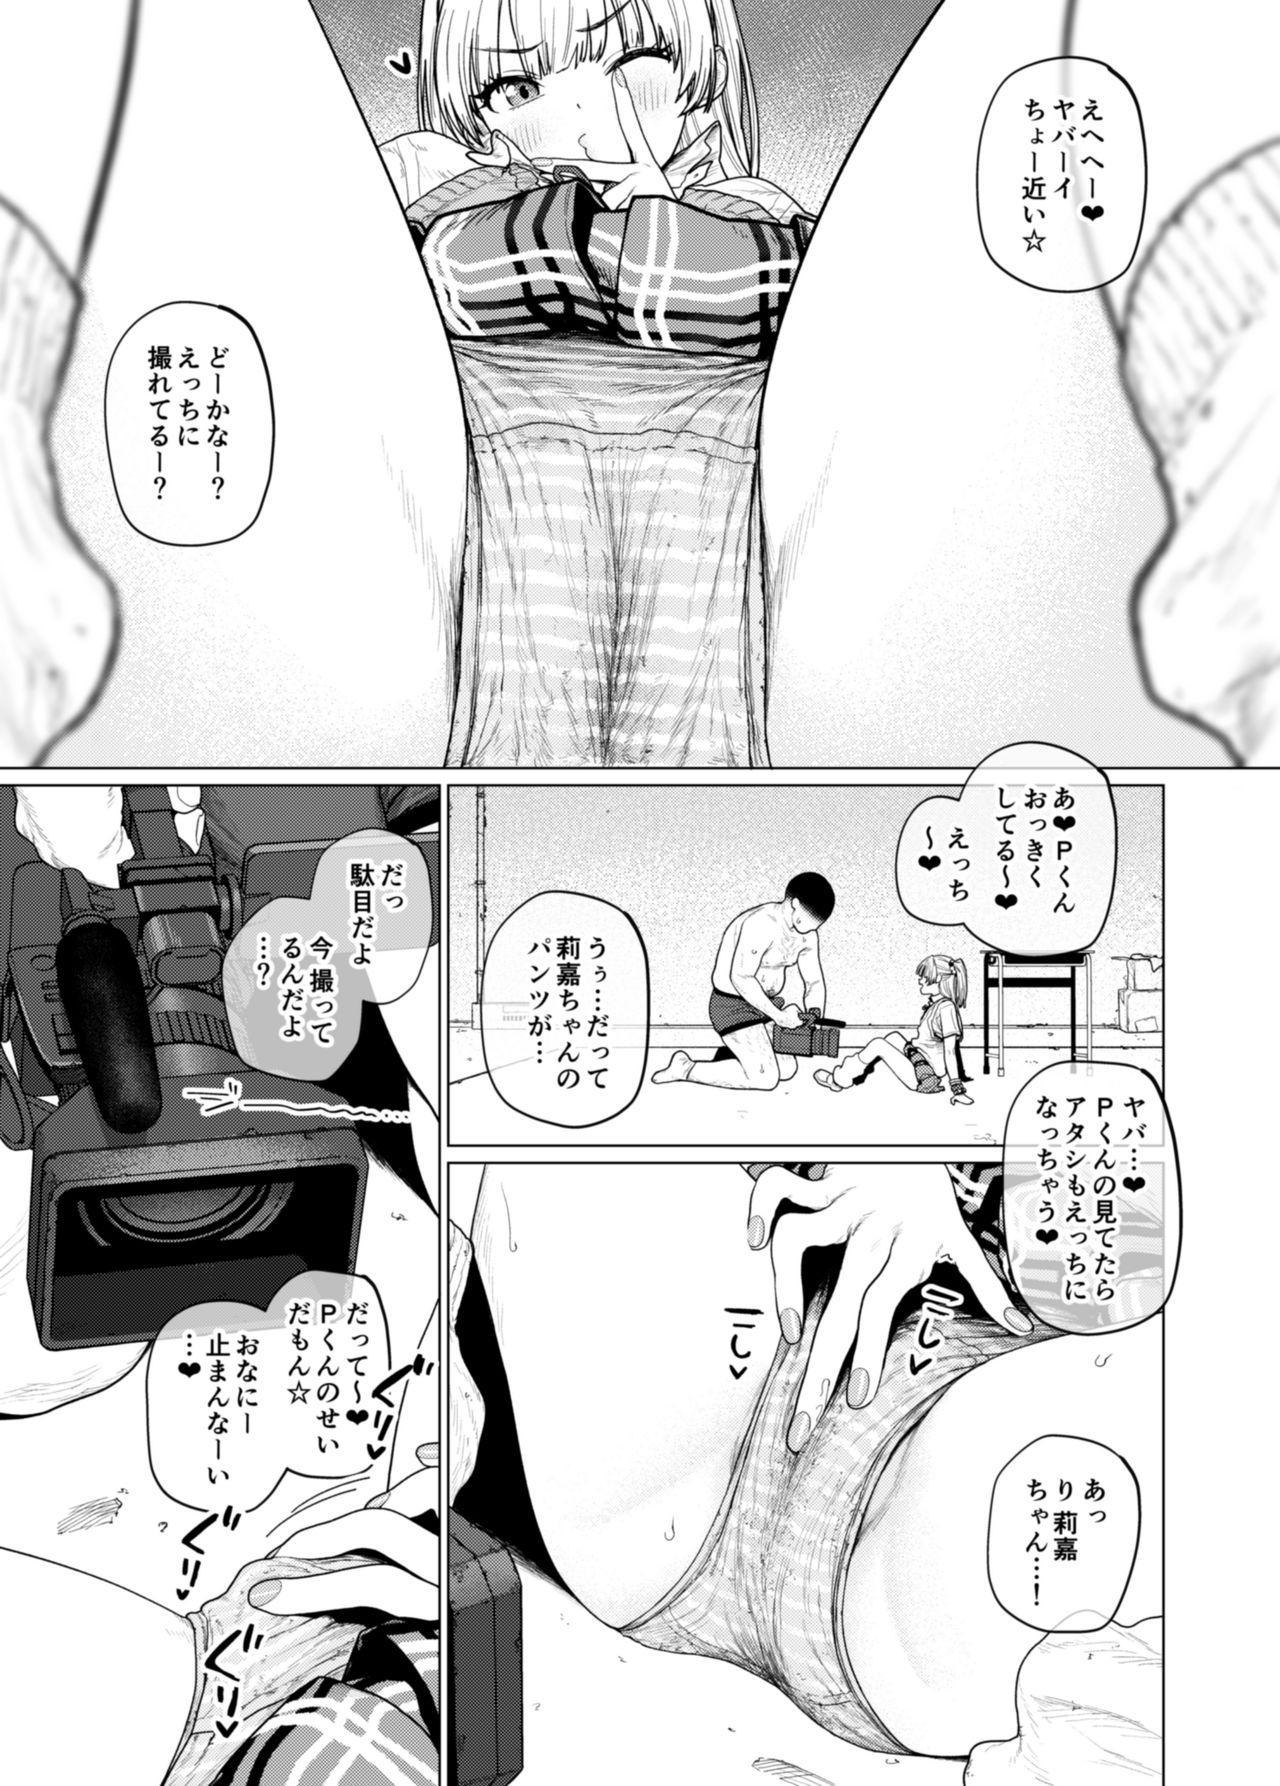 Charisma Chibi Gal ☆ Last Minute Ecchi 3